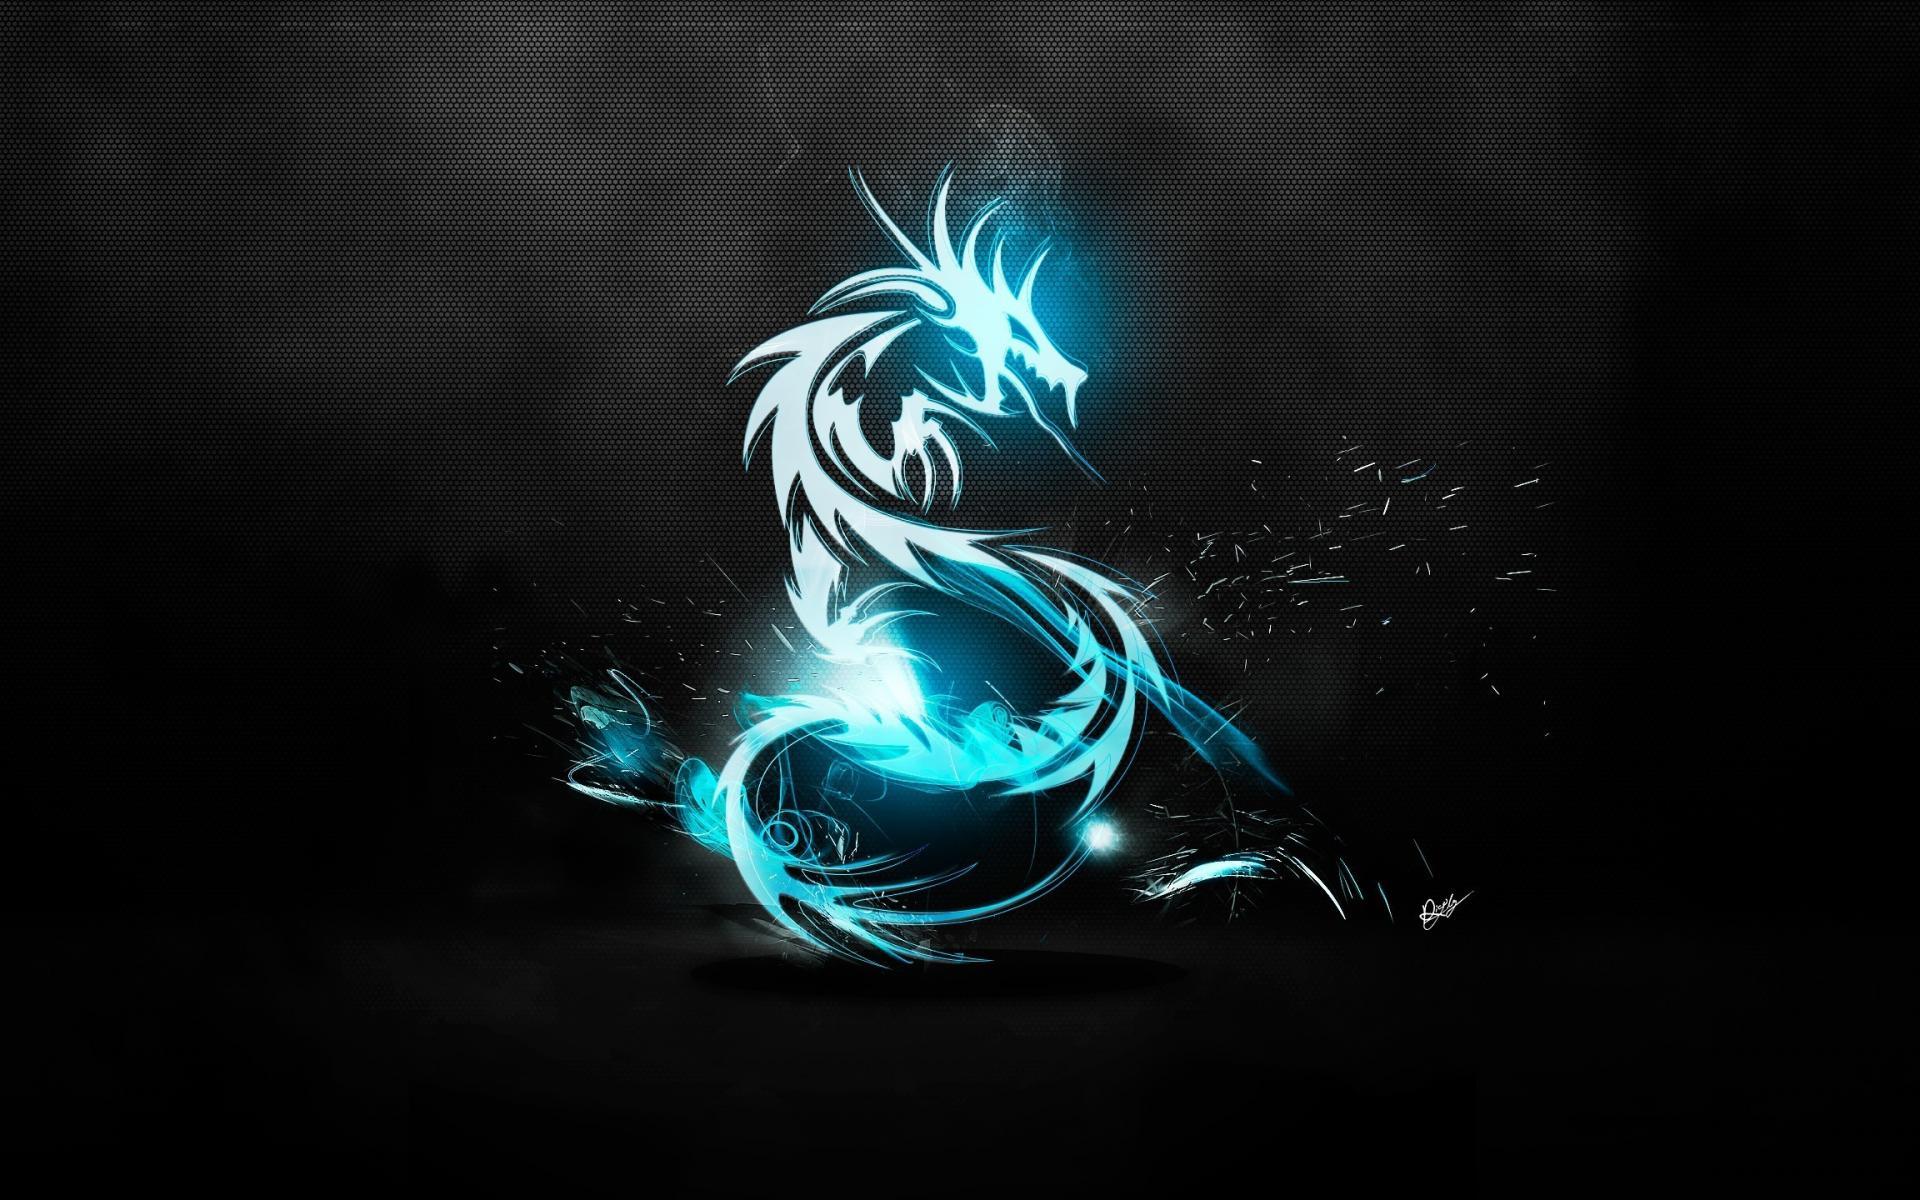 Blue Dragon Art Wallpaper  Jpg